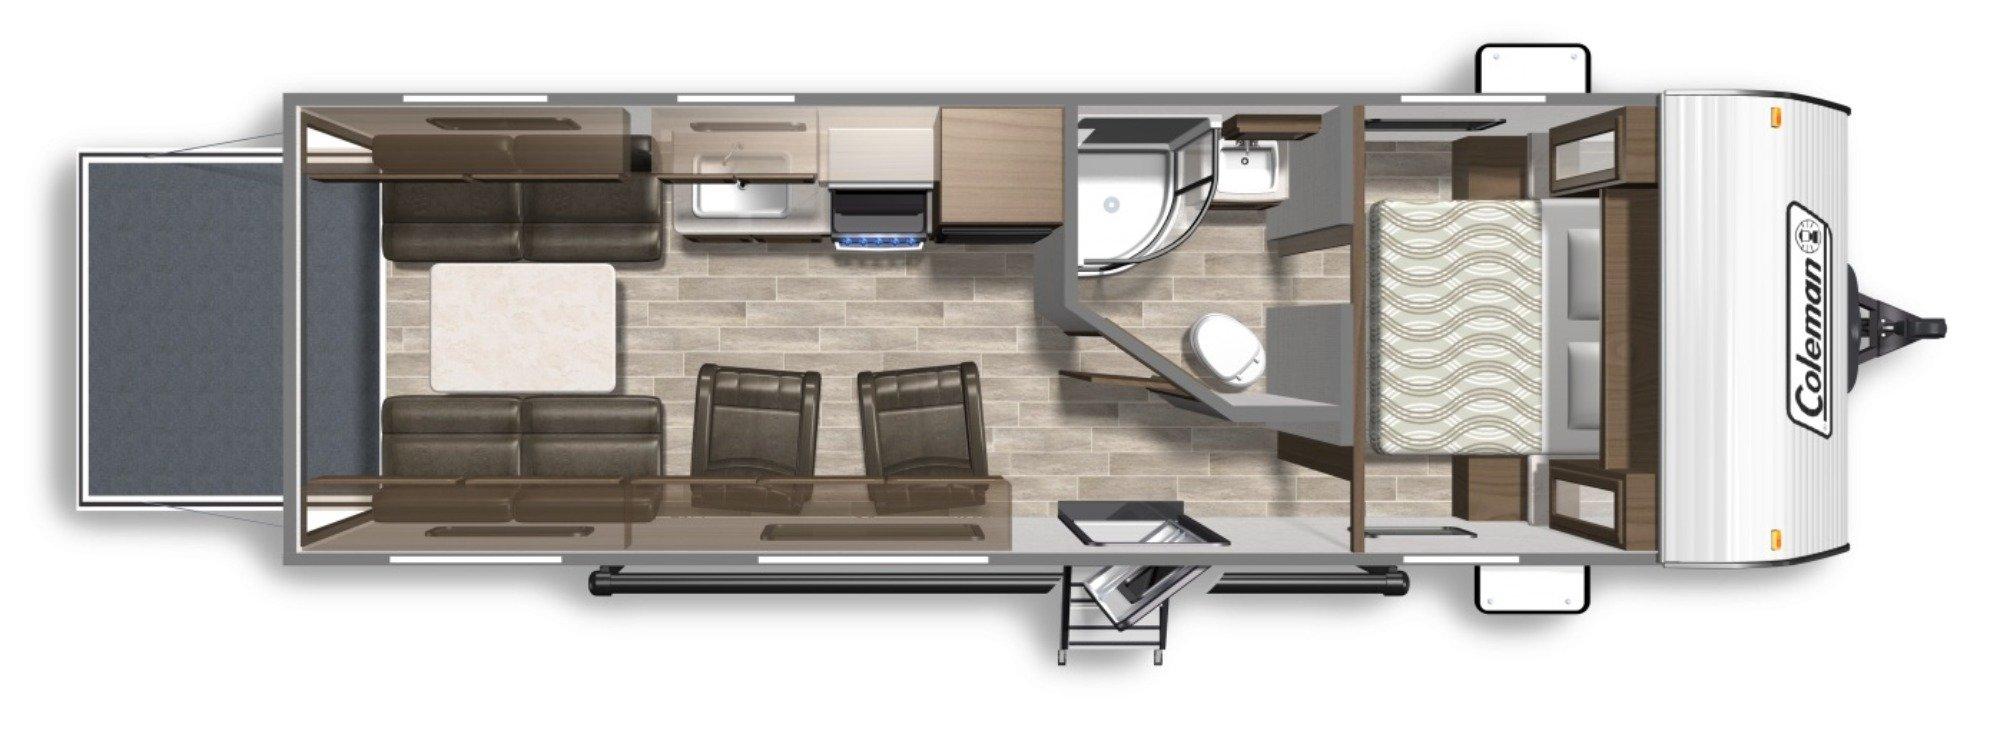 View Floor Plan for 2020 COLEMAN COLEMAN LANTERN 250TQ